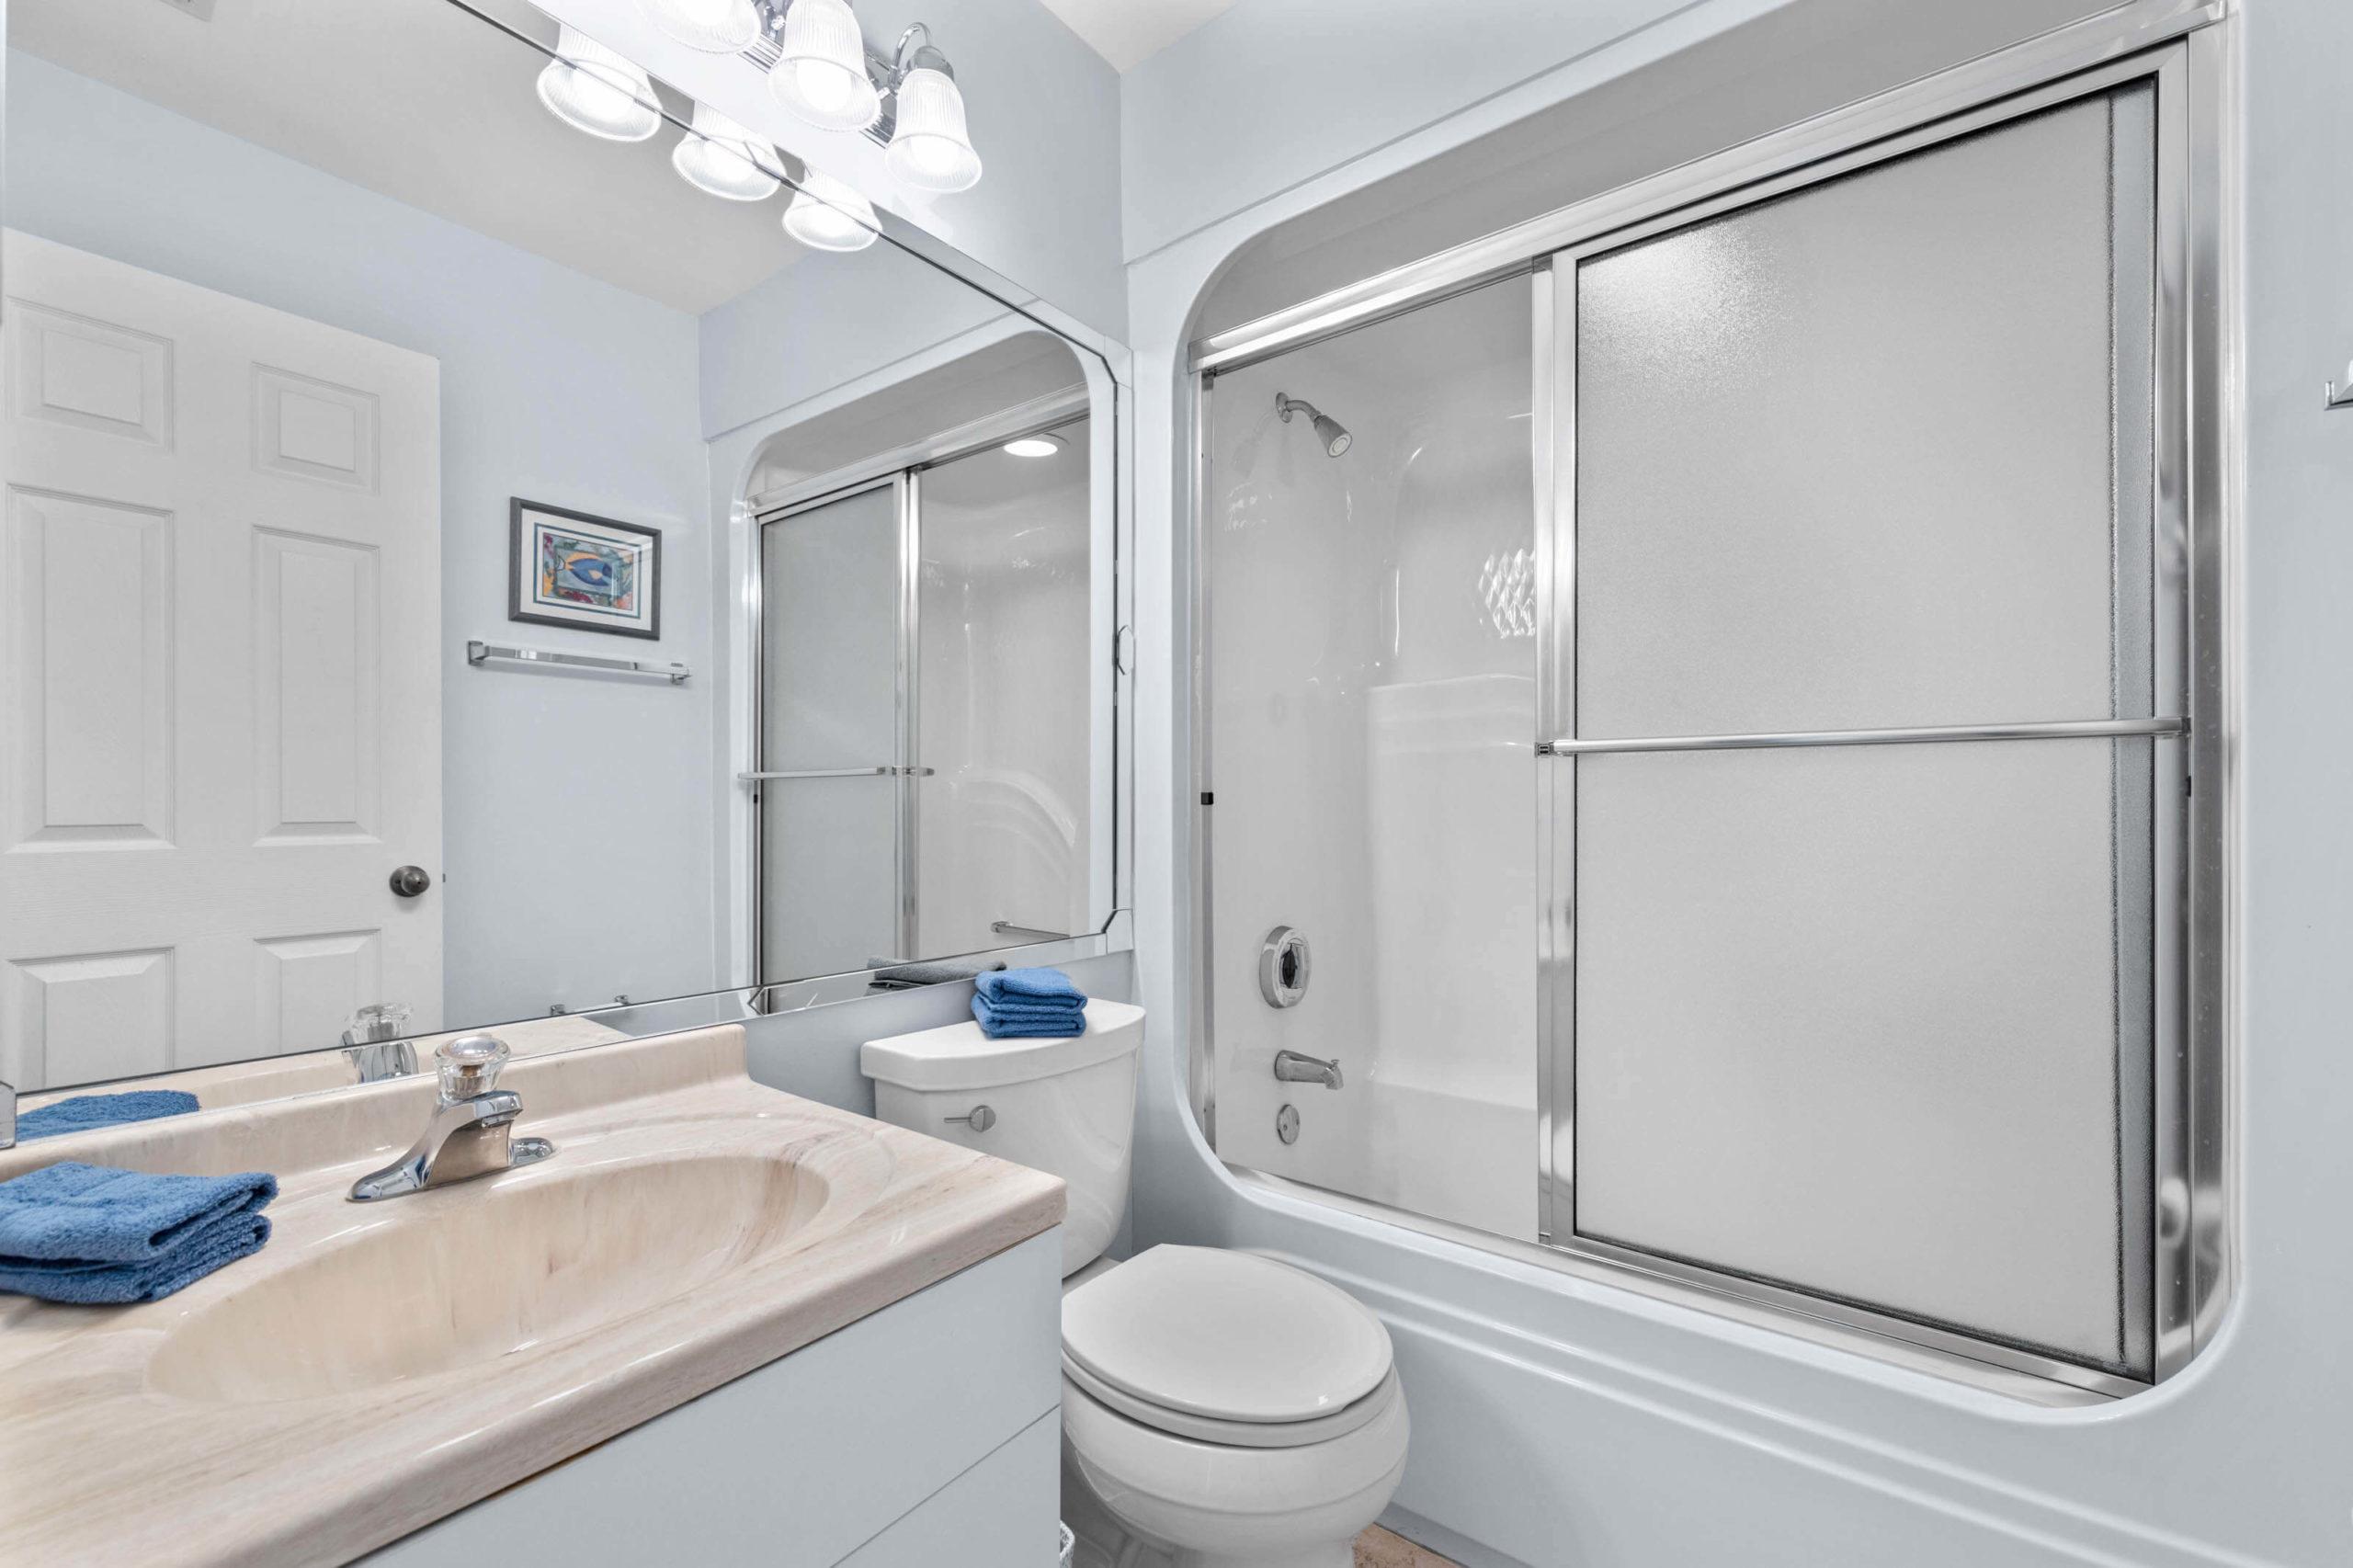 452 Belina Dr 1302 - Guest Bathroom